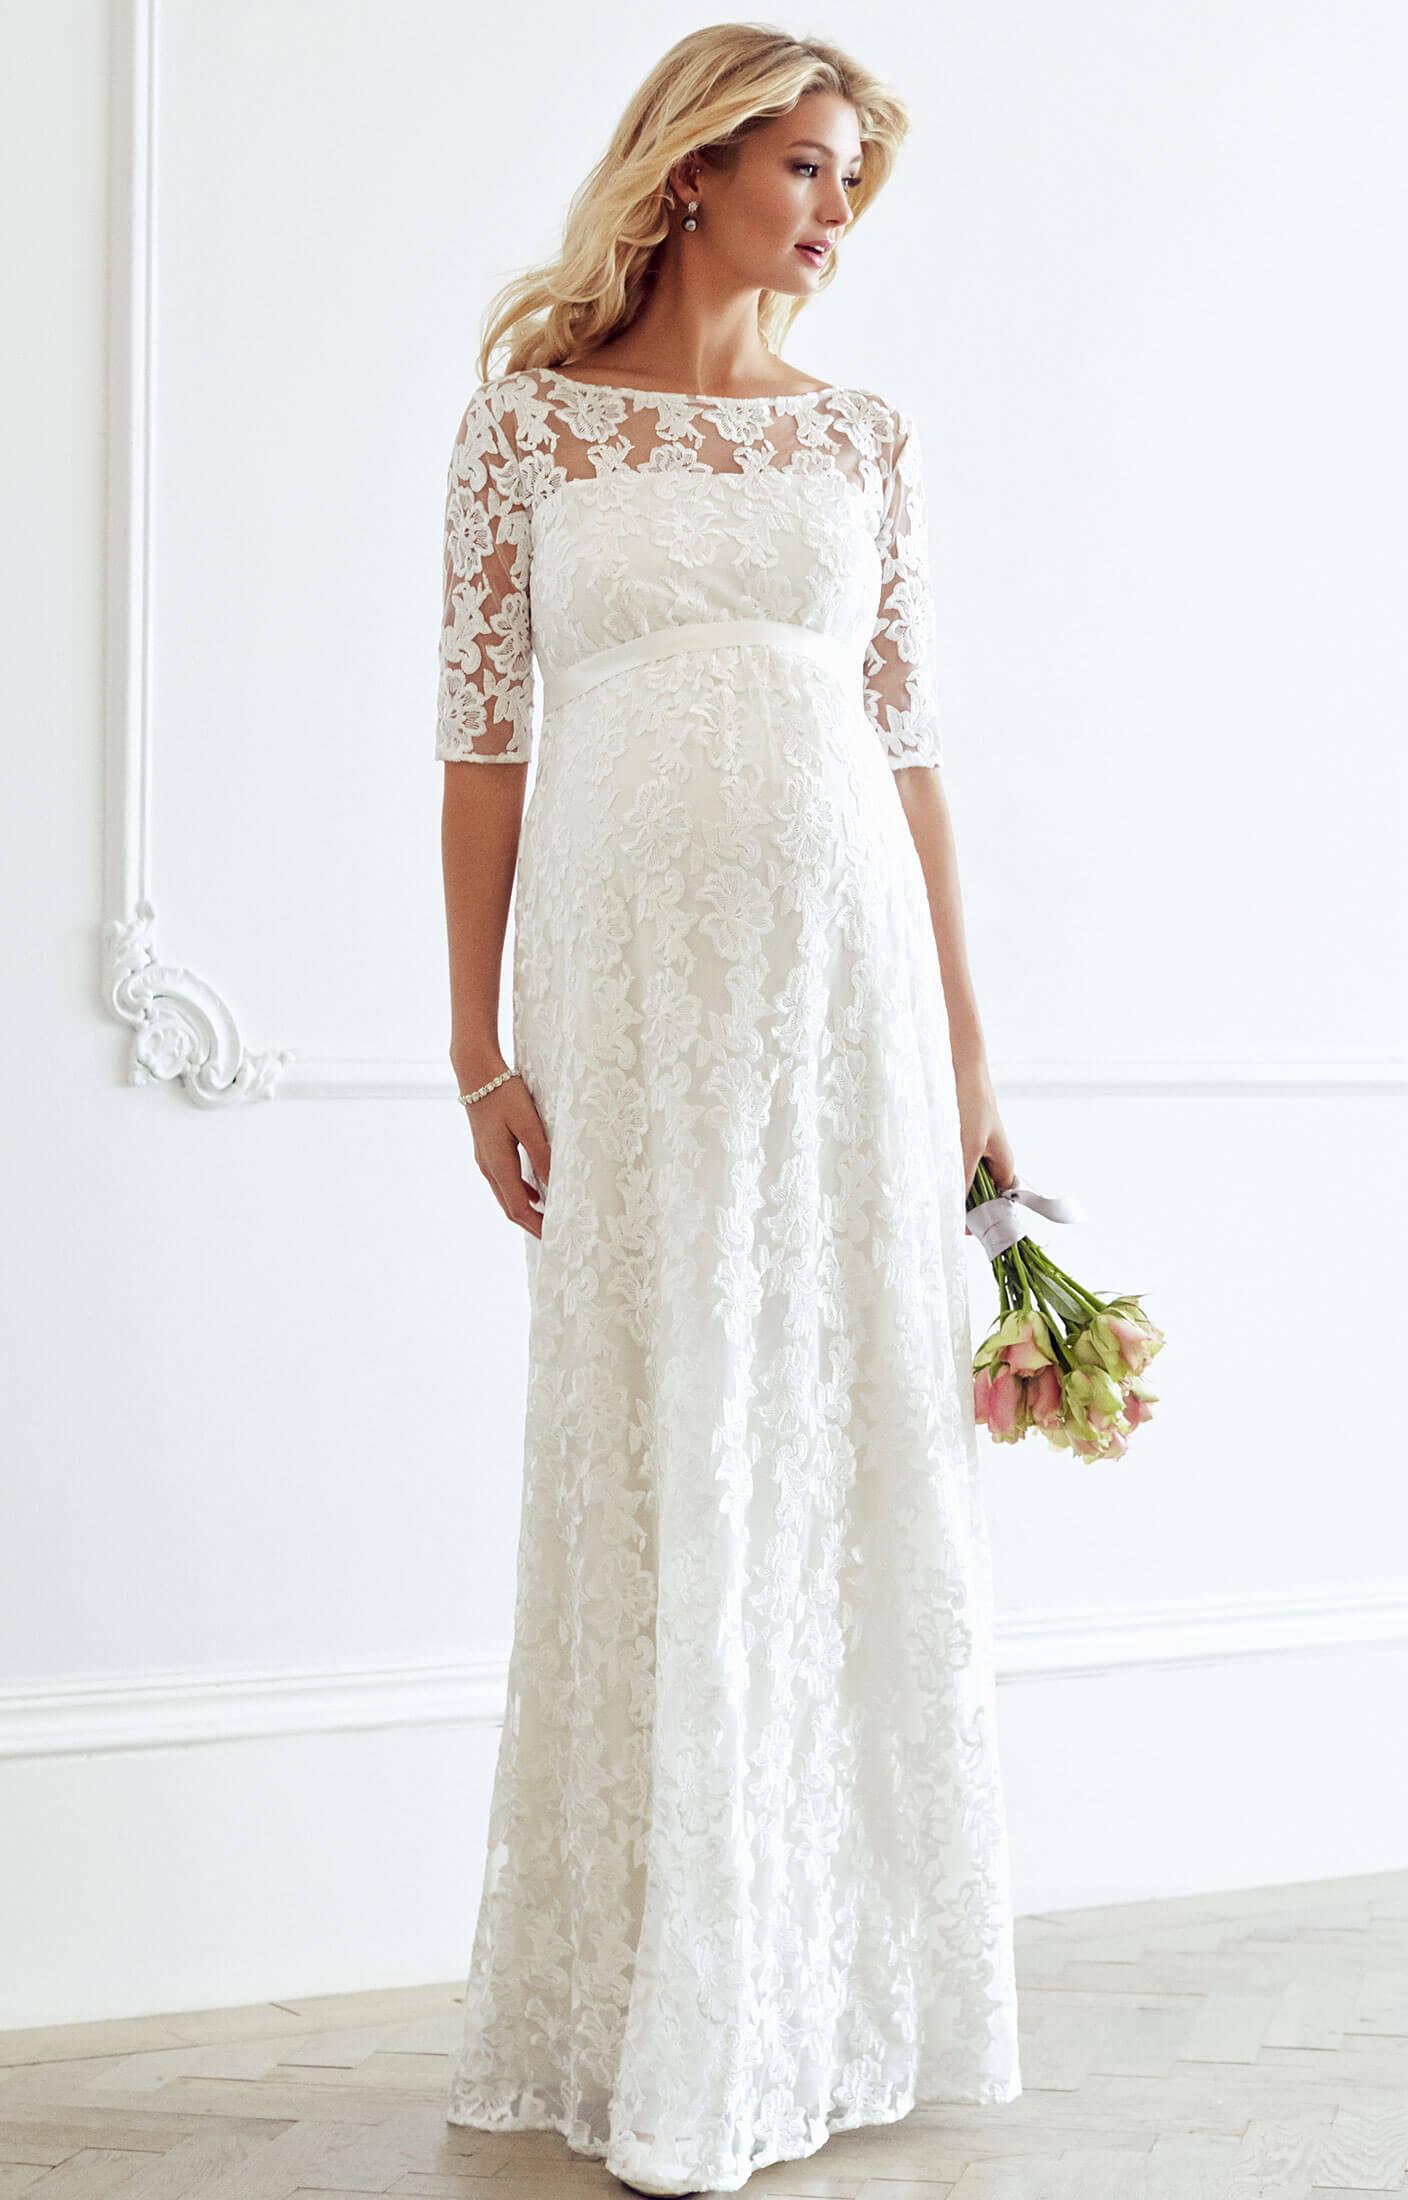 Asha Maternity Wedding Gown Ivory - Maternity Wedding Dresses ...